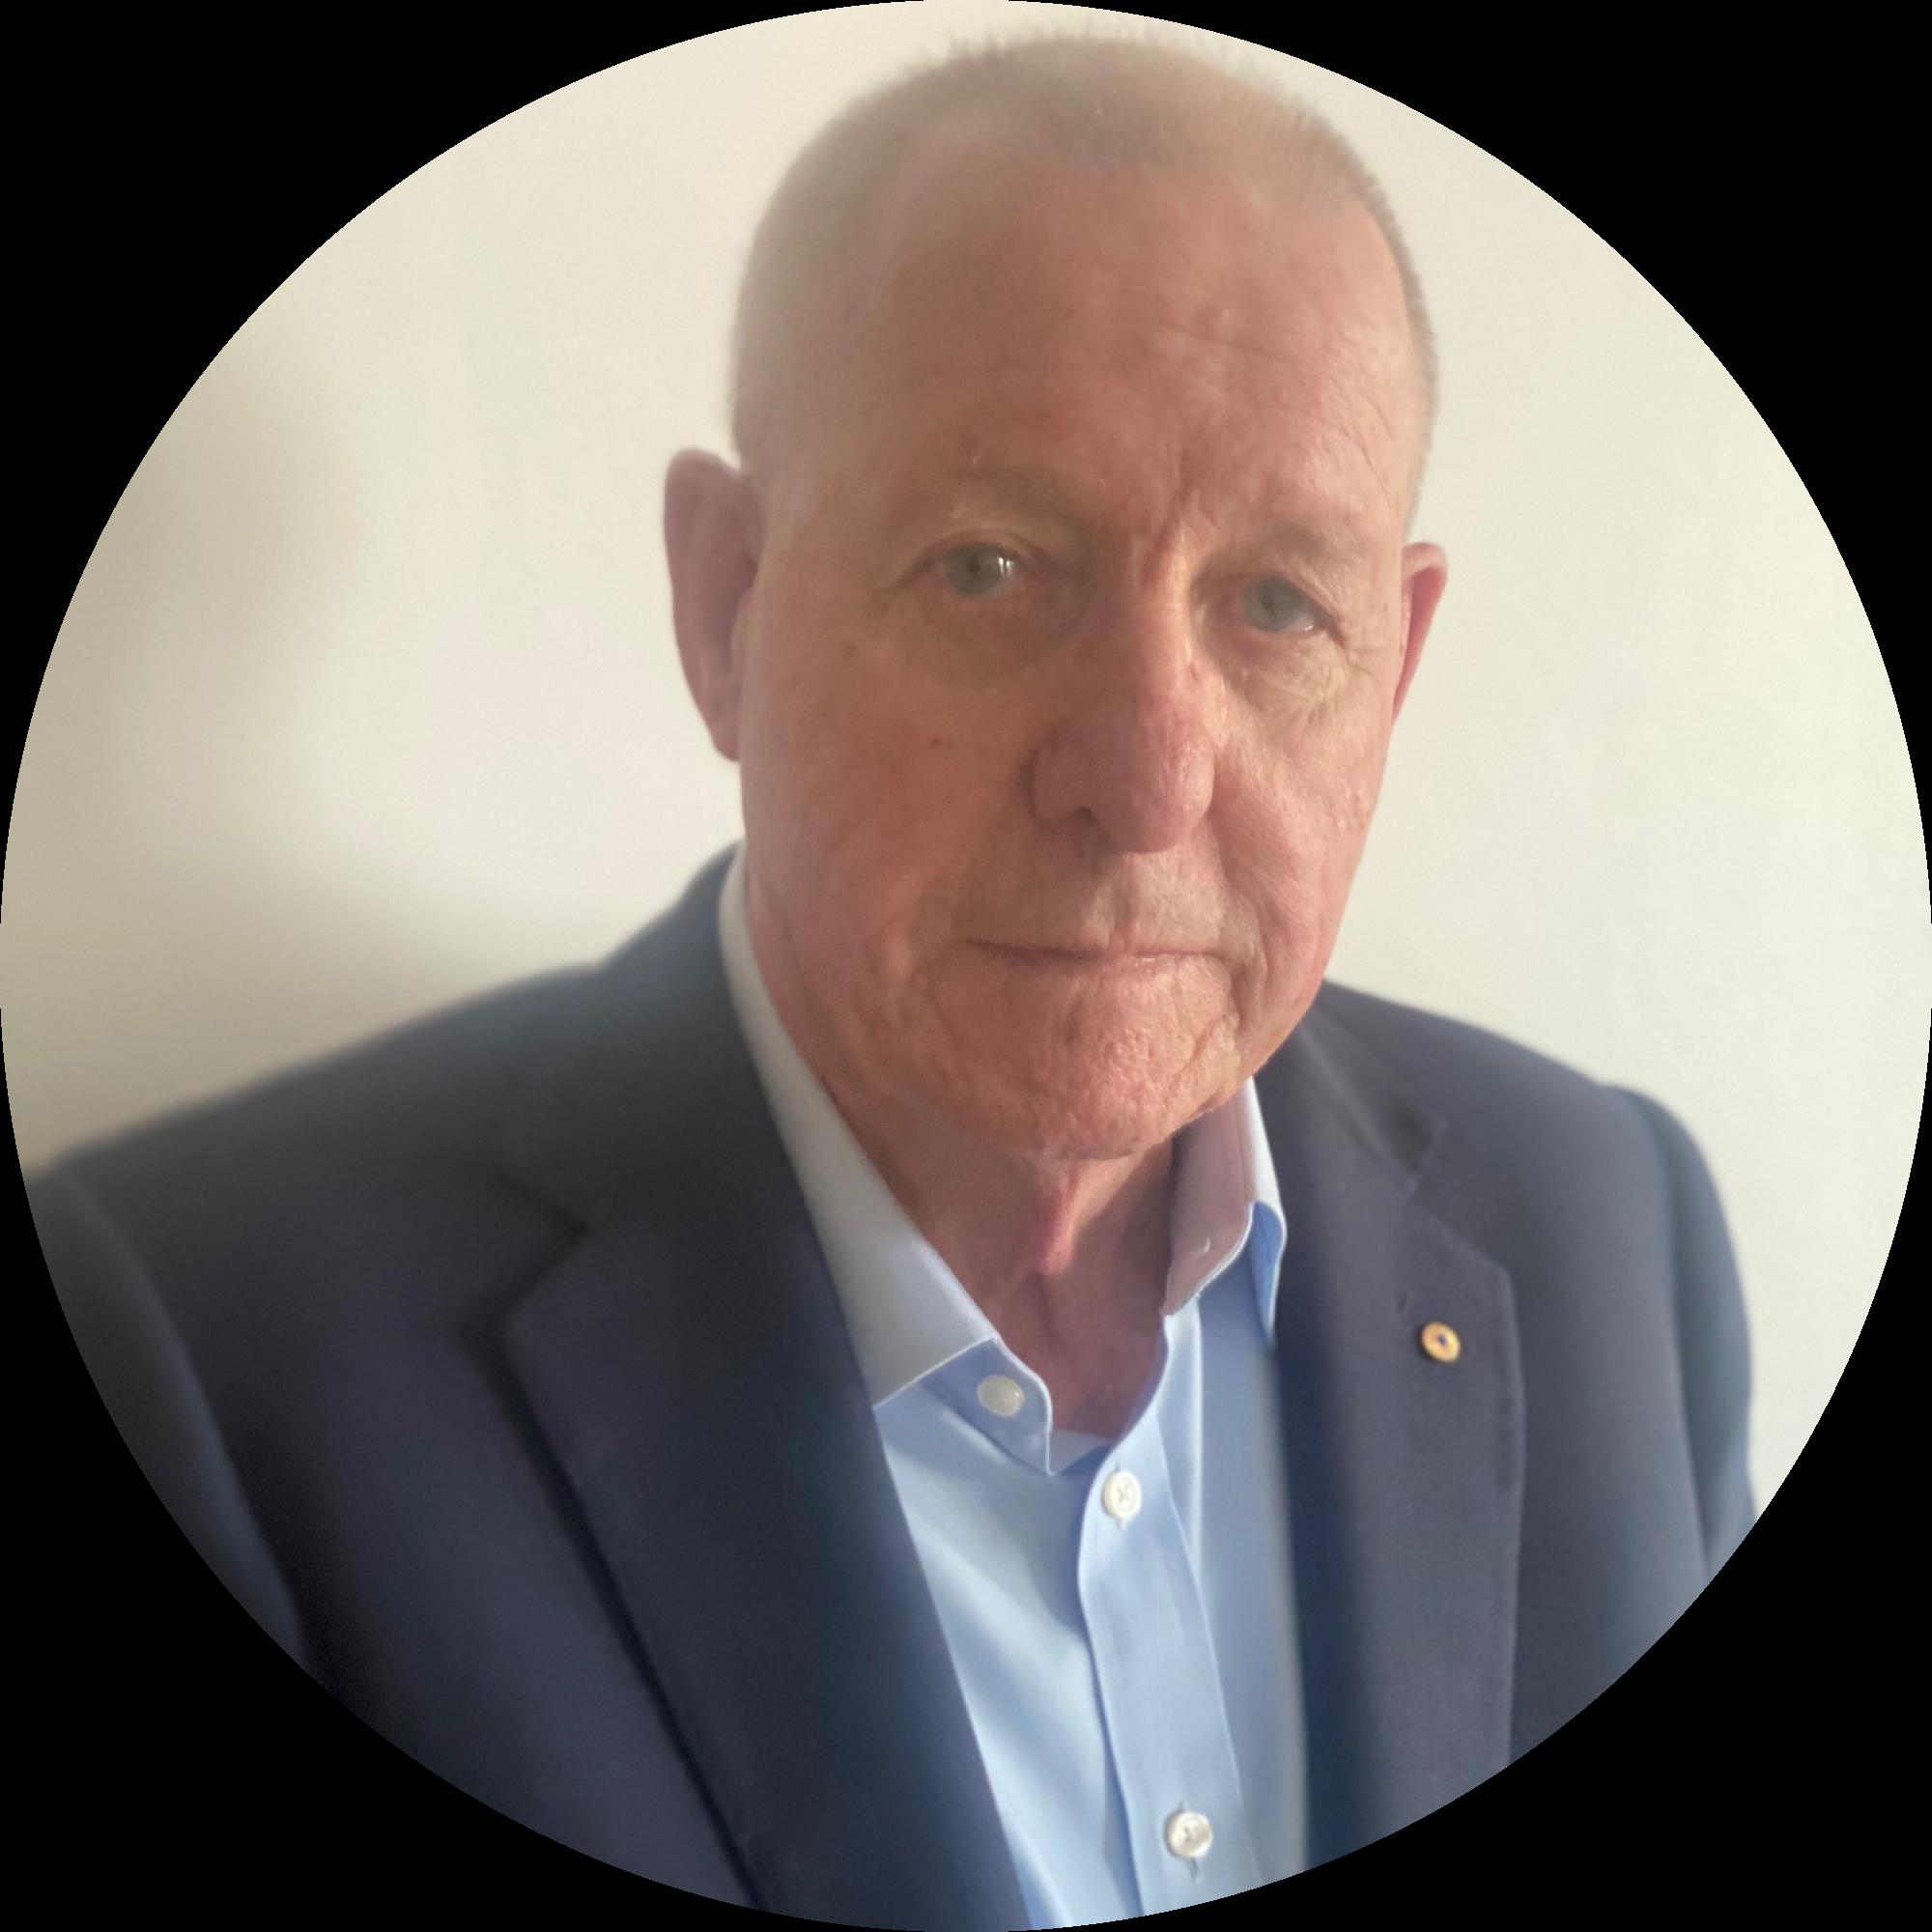 Mr. Jock Murray AO – Chairman